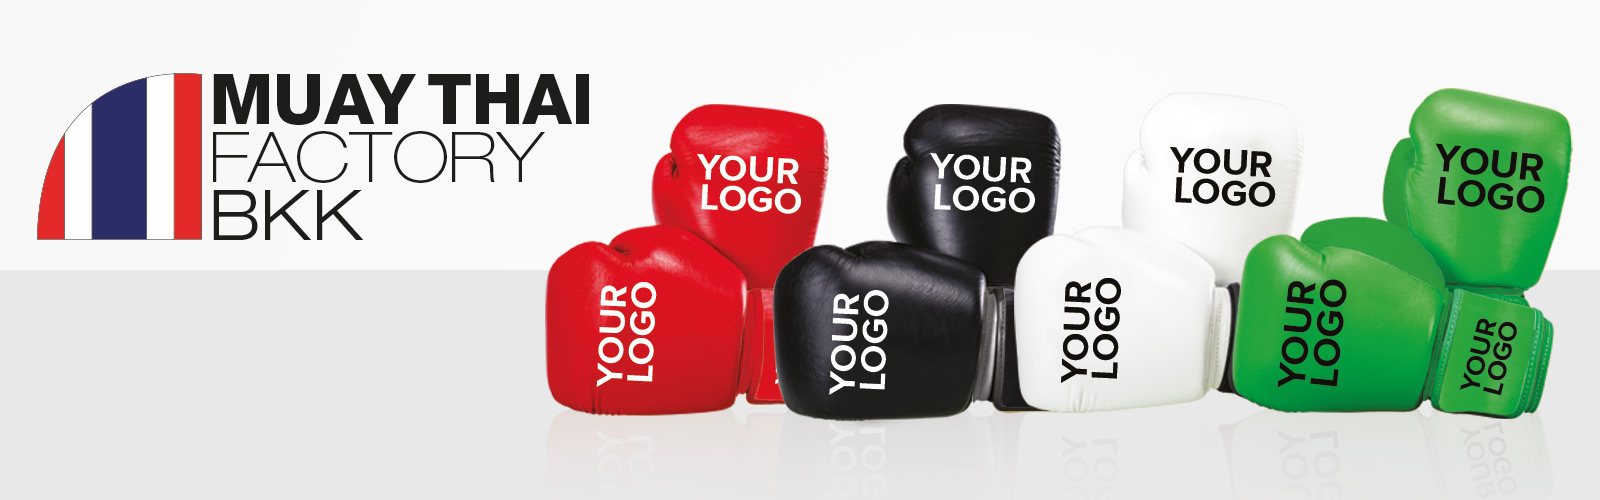 Muay Thai Factory Promo Codes